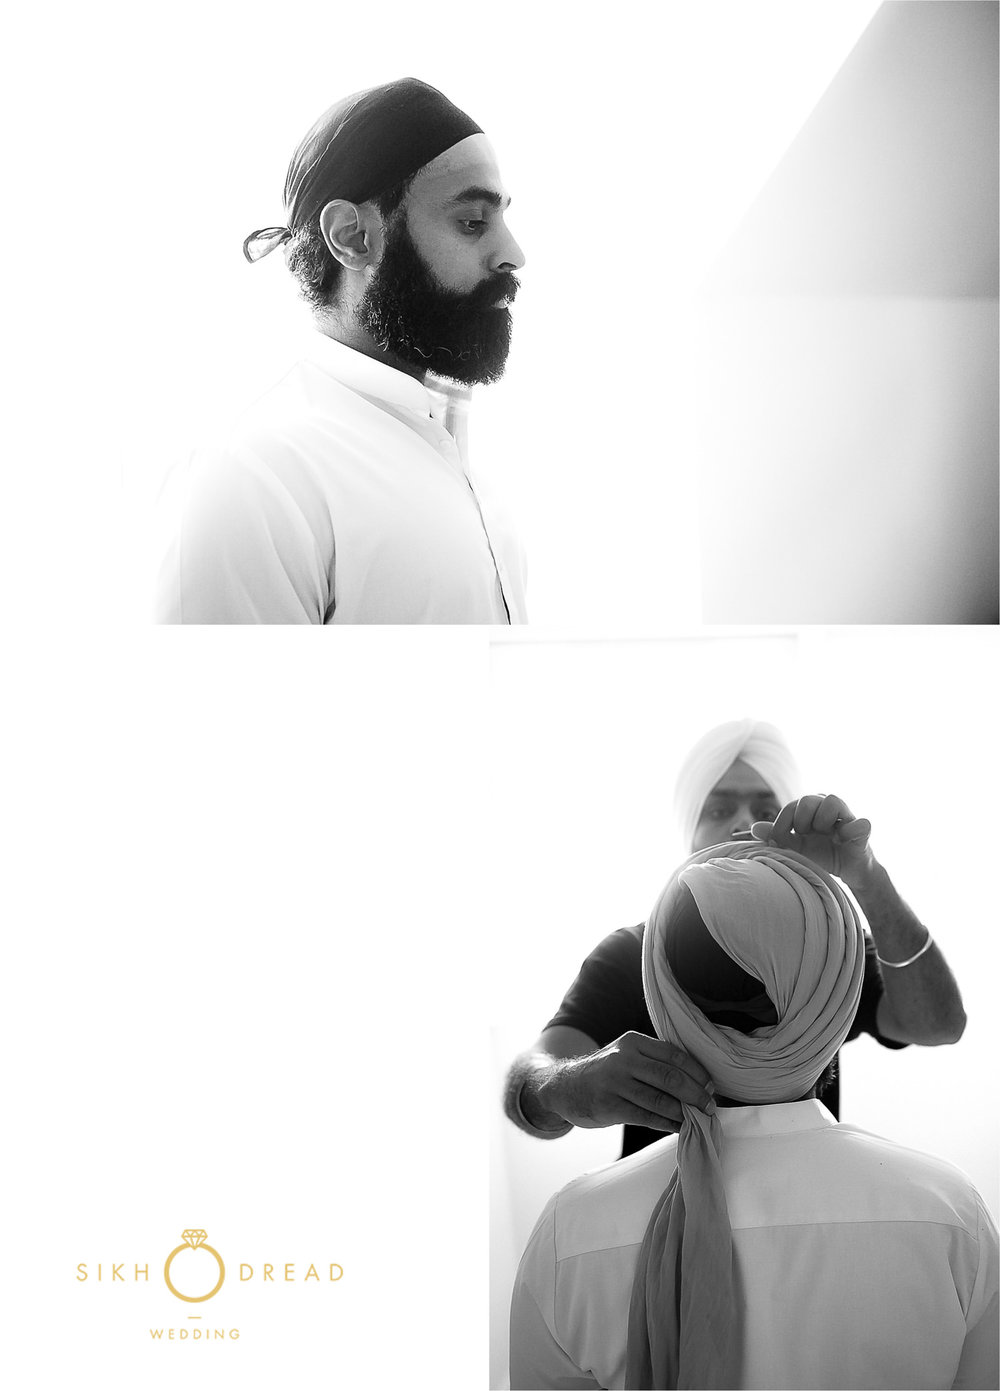 Sikh groom getting ready tying pagh